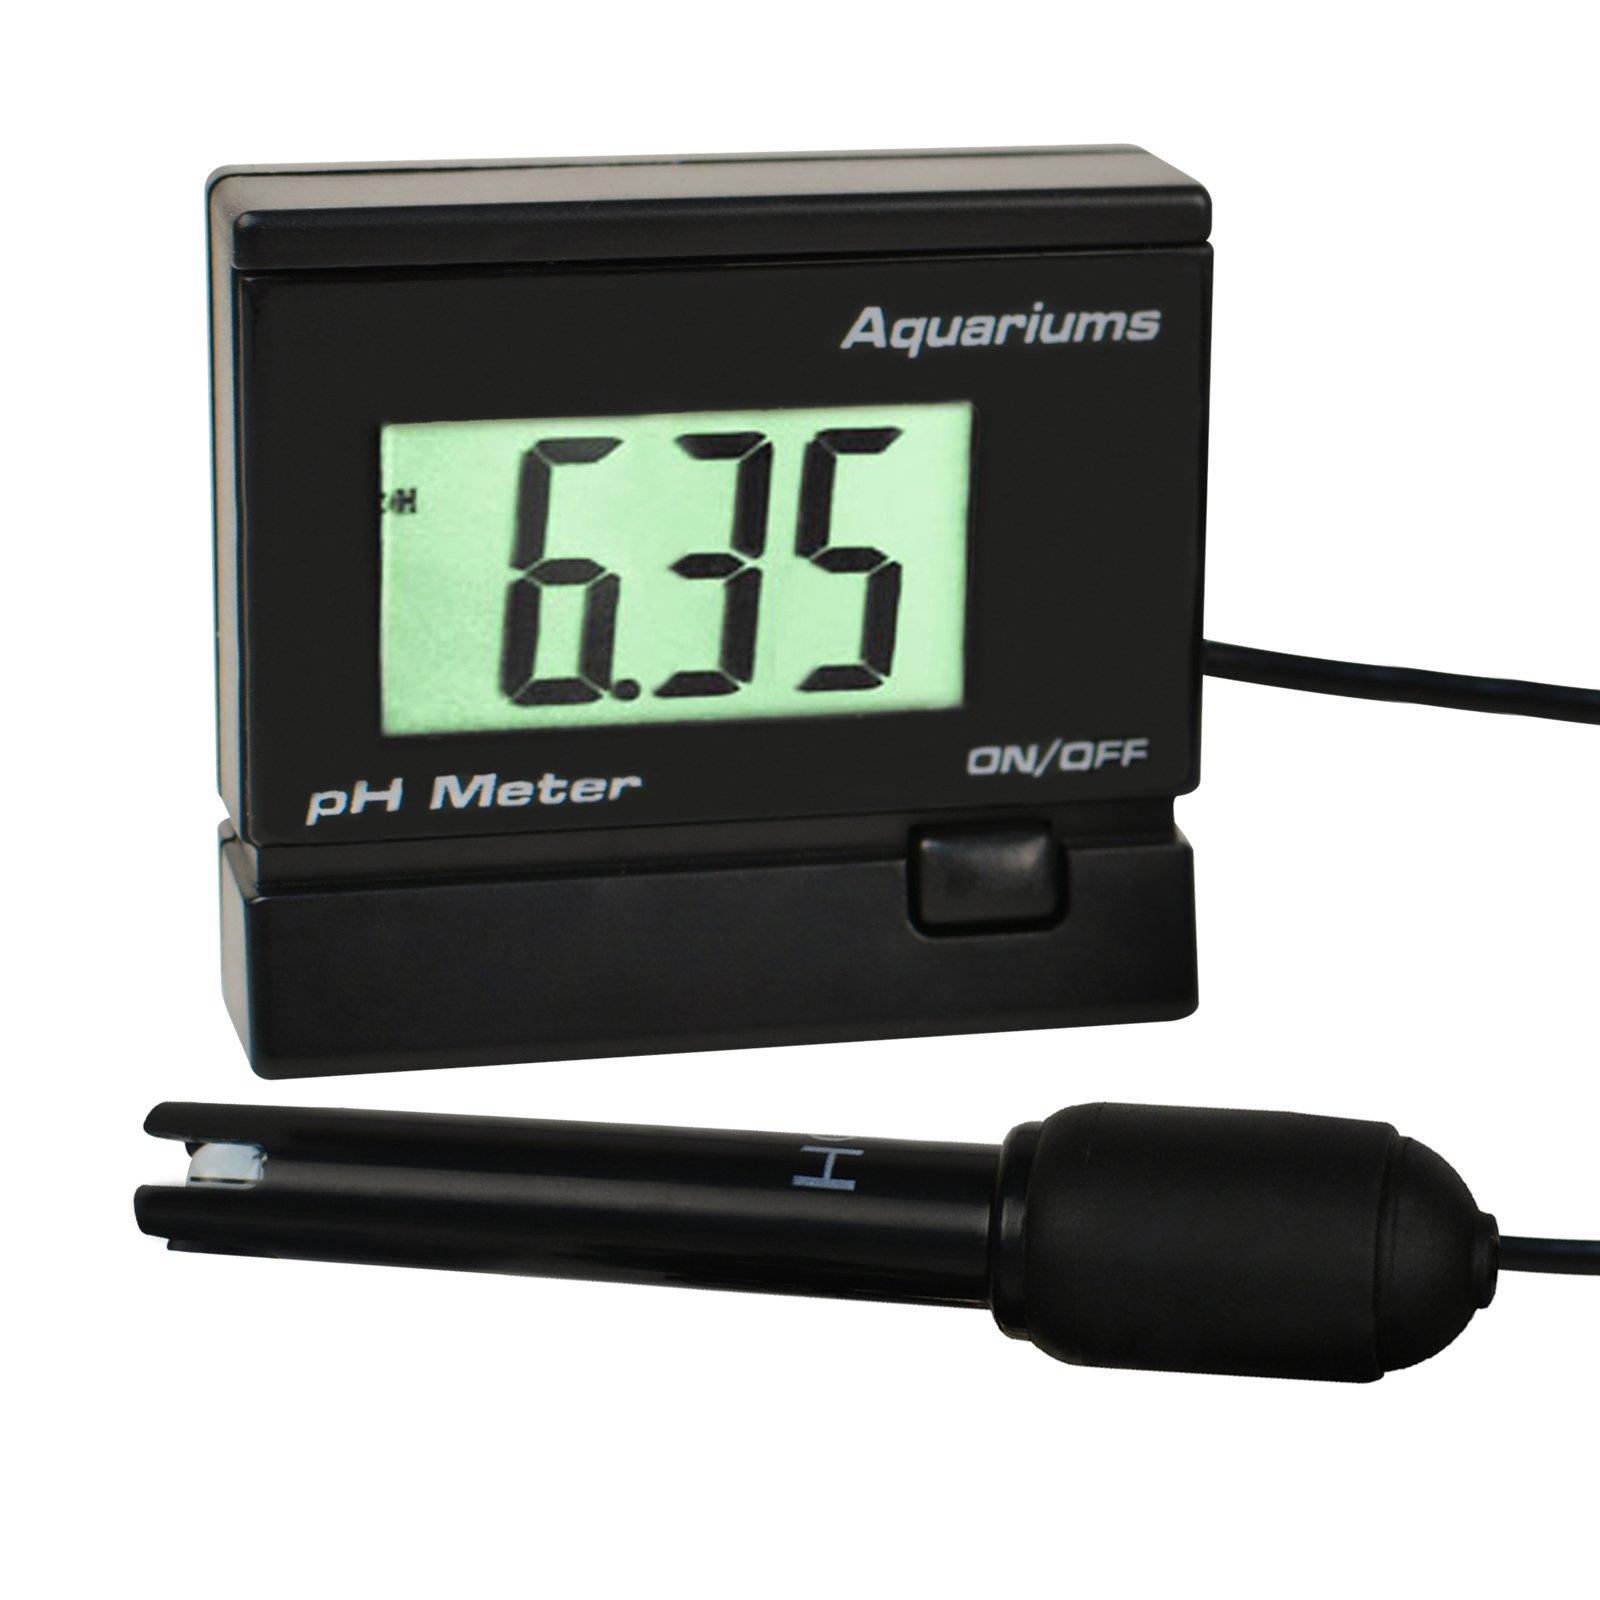 Digital pH Water Quality Meter Tester Monitor with Replaceable BNC Electrode Probe Adjustable Mounting Bracket for Aquarium Tank Waterproof